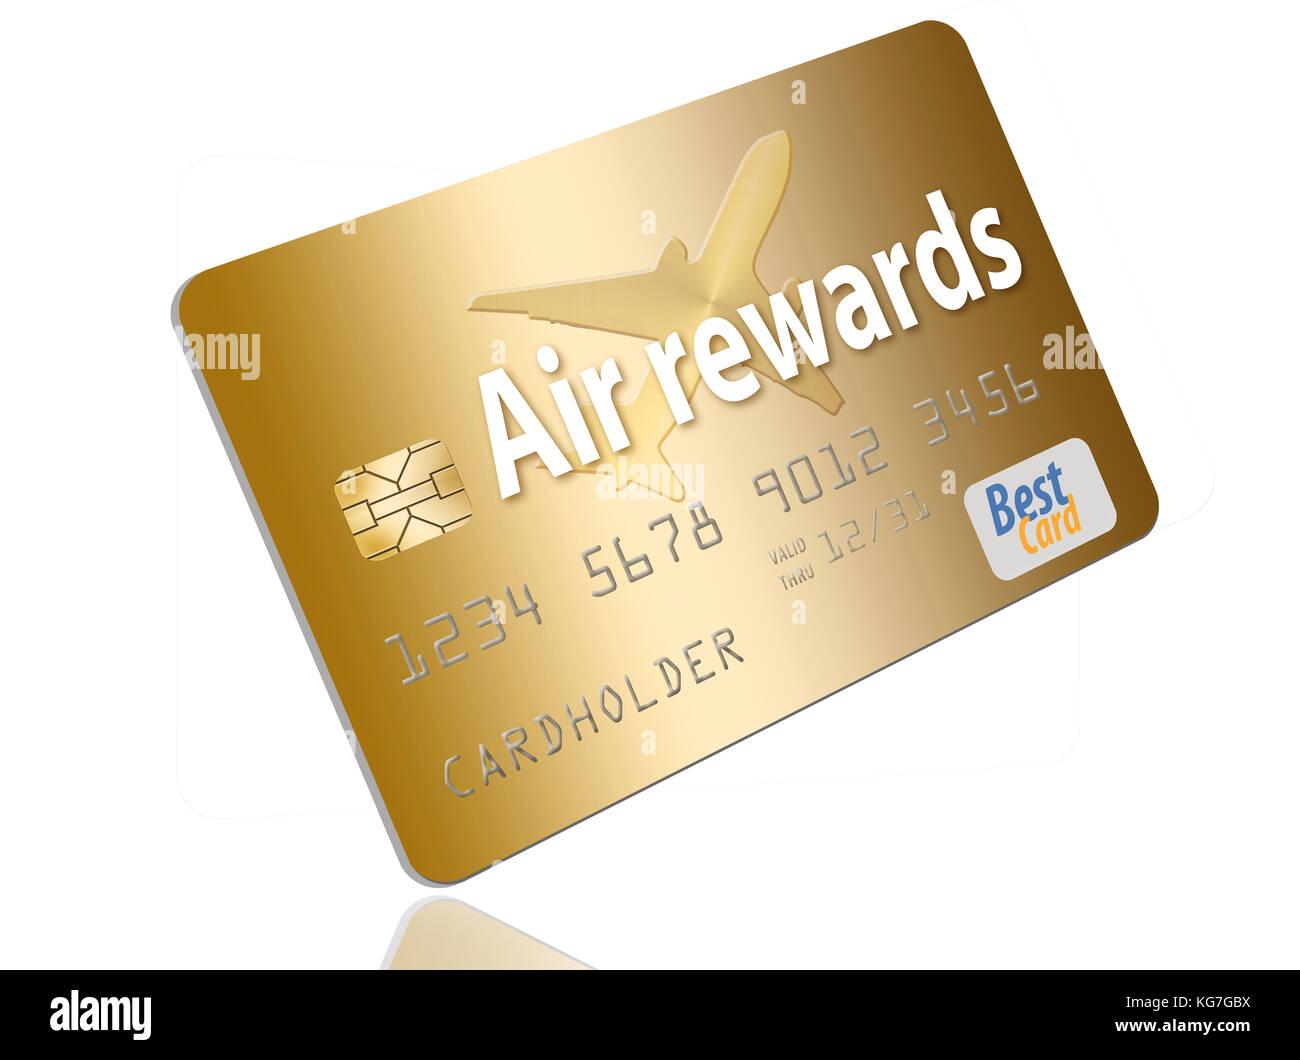 Air miles credit card stock photos air miles credit card stock air miles and rewards credit card stock image colourmoves